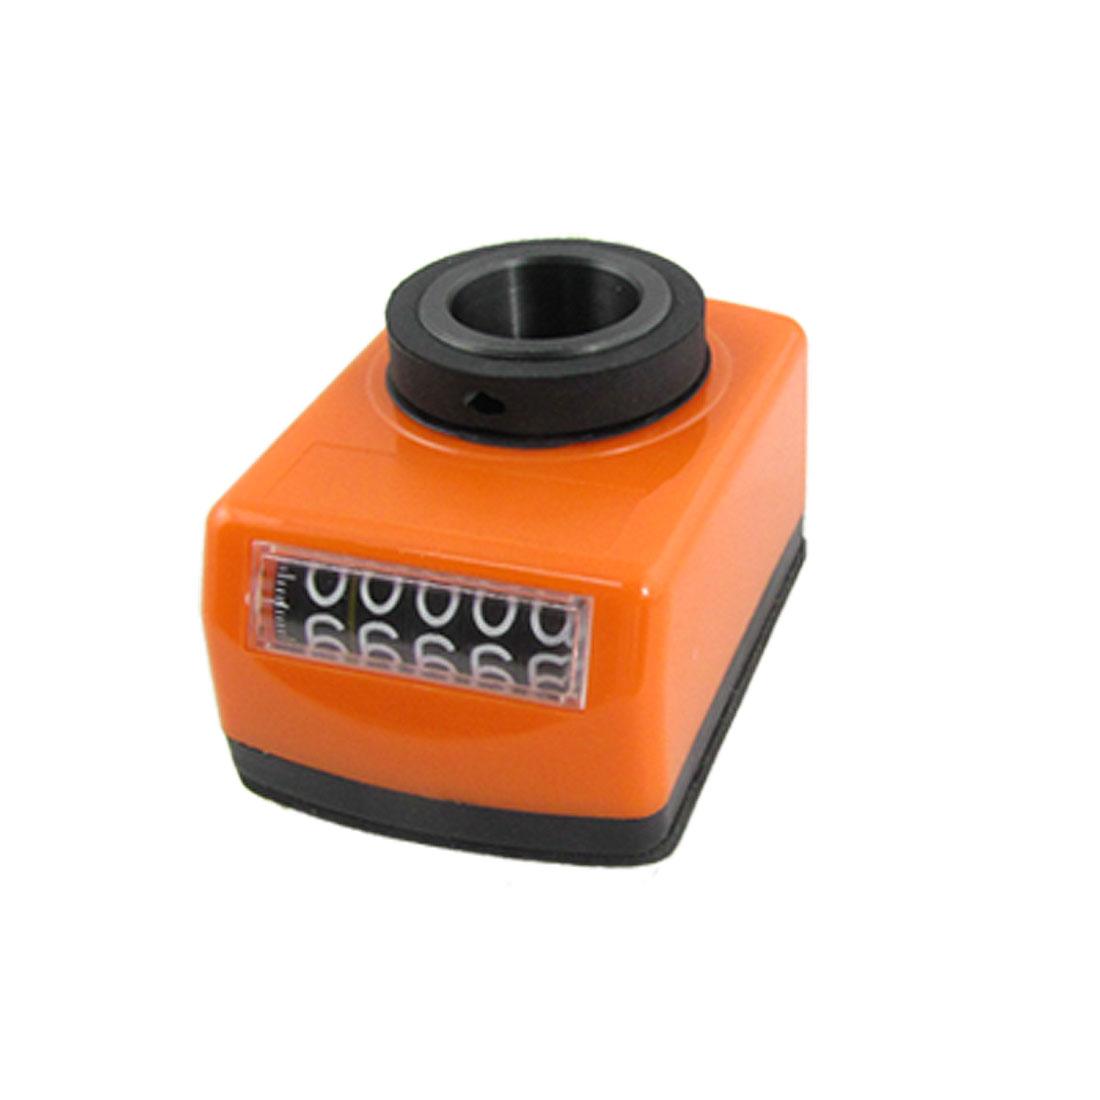 20mm Bore Orange Plastic Shell Machanical Digital Position Indicator